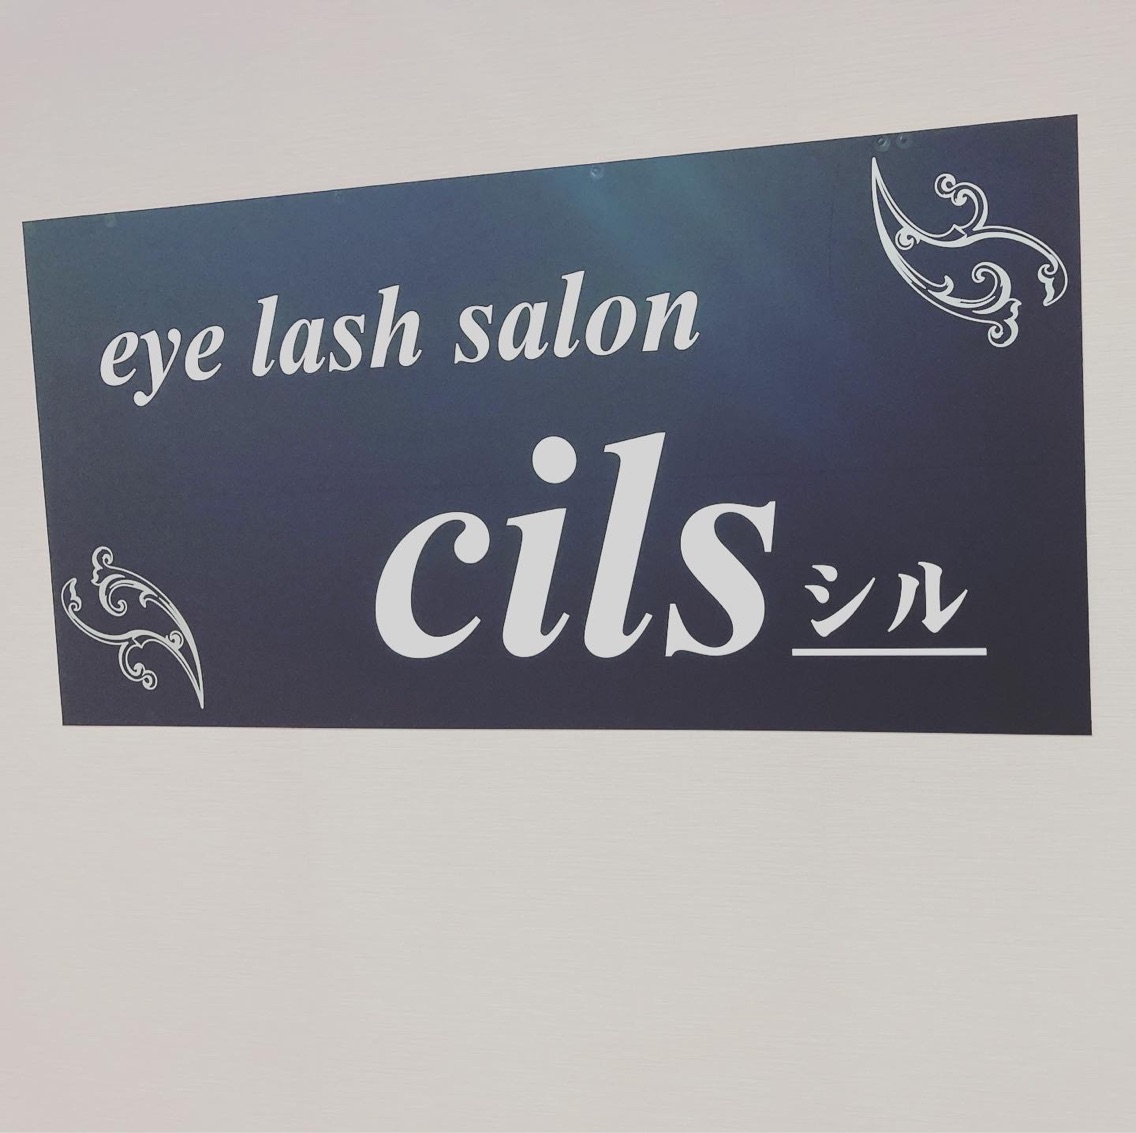 eye lash salon cils